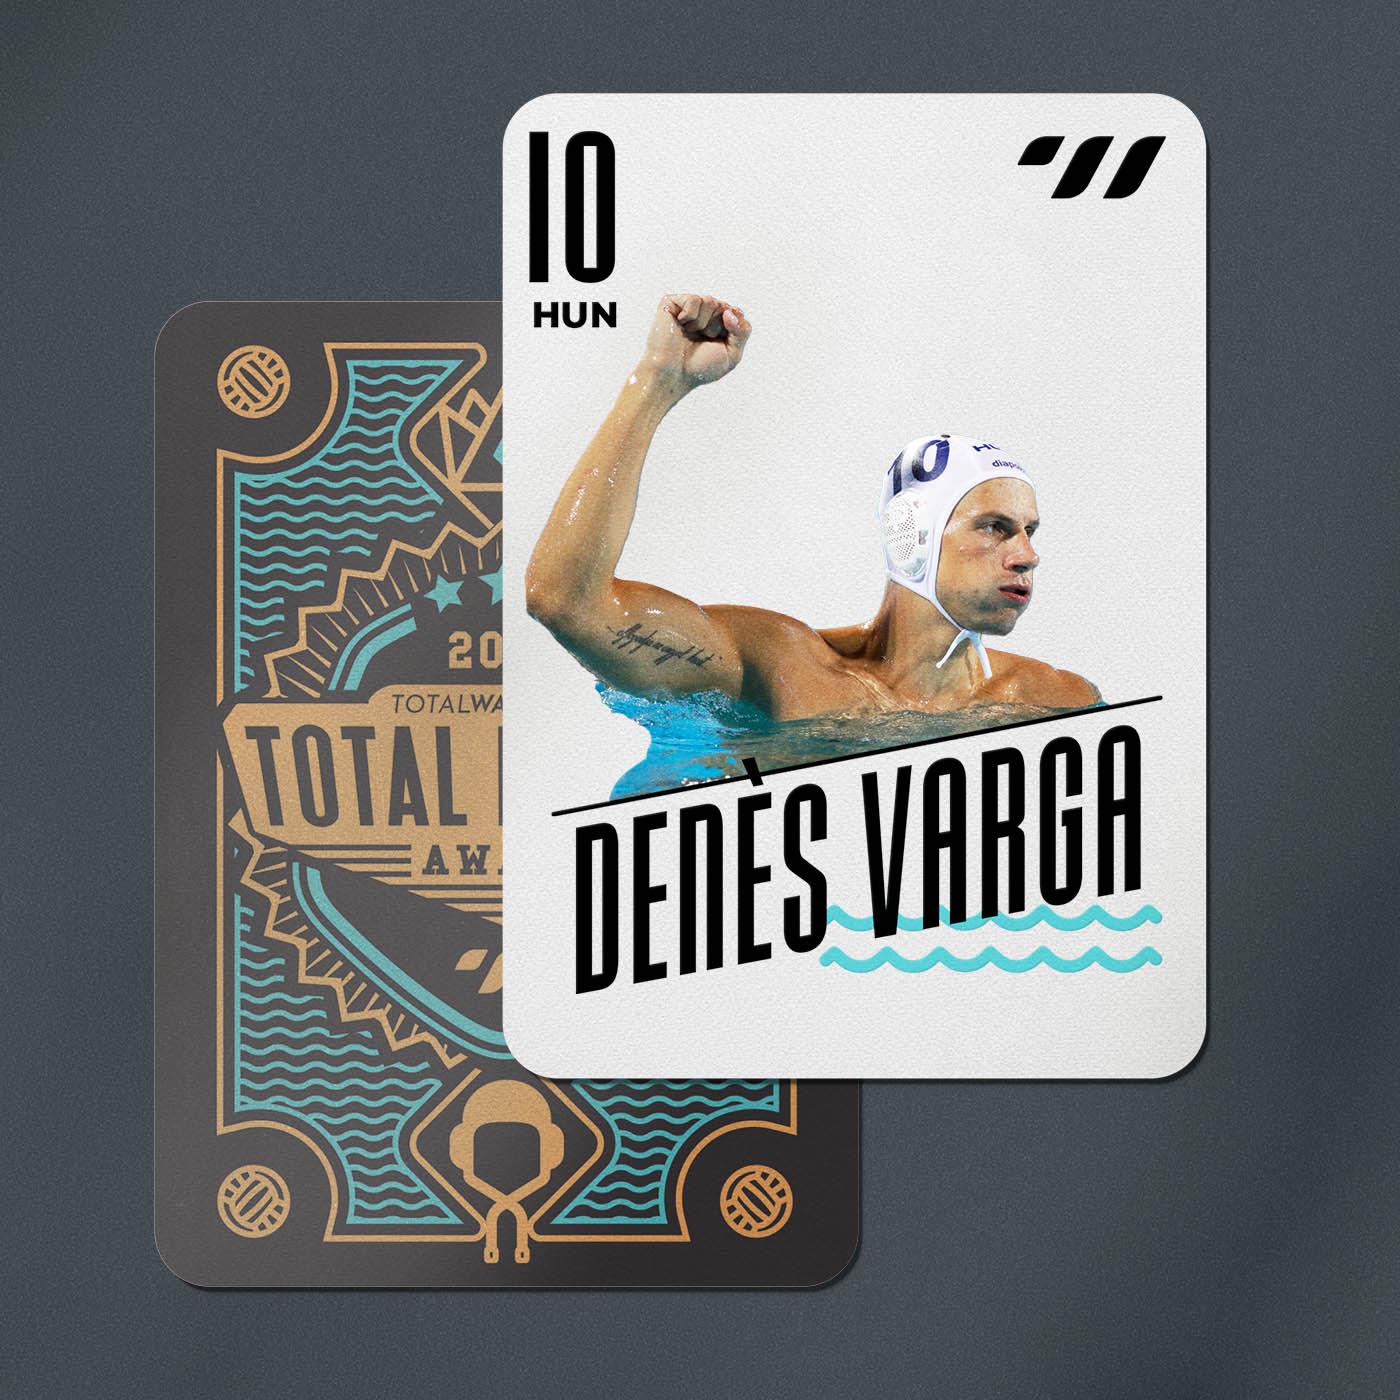 LEFT SIDE - Denes Varga (HUN)